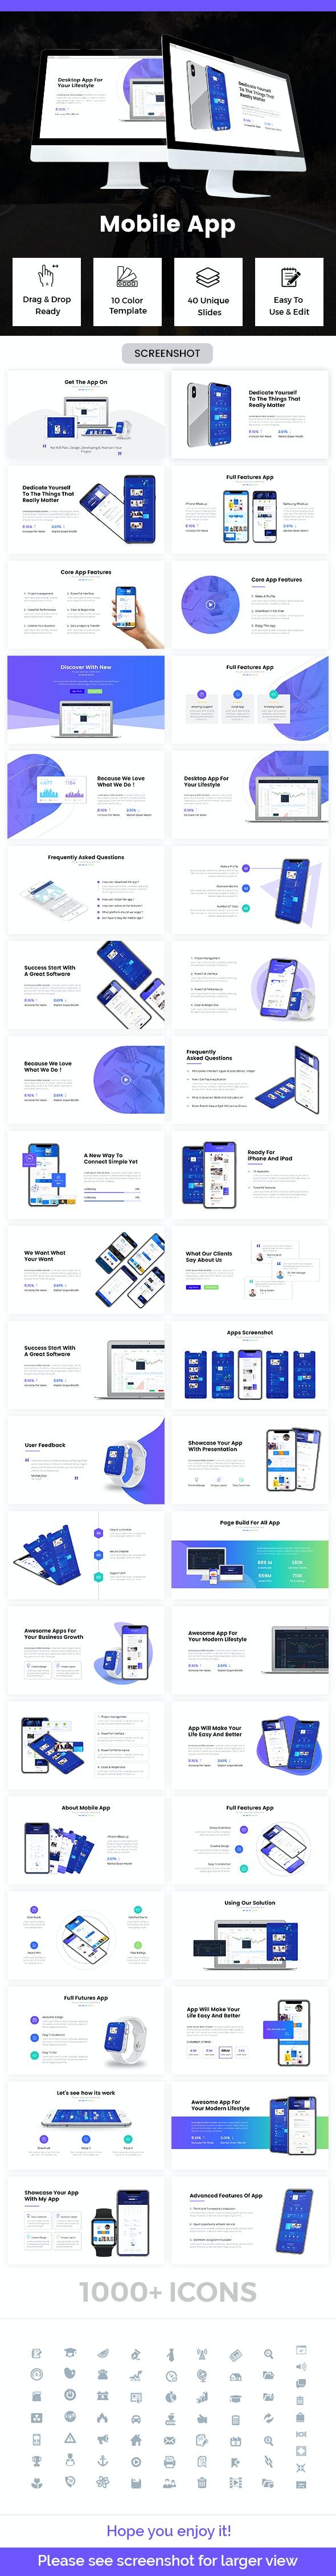 Mobile App Keynote Template 2019 - Business Keynote Templates